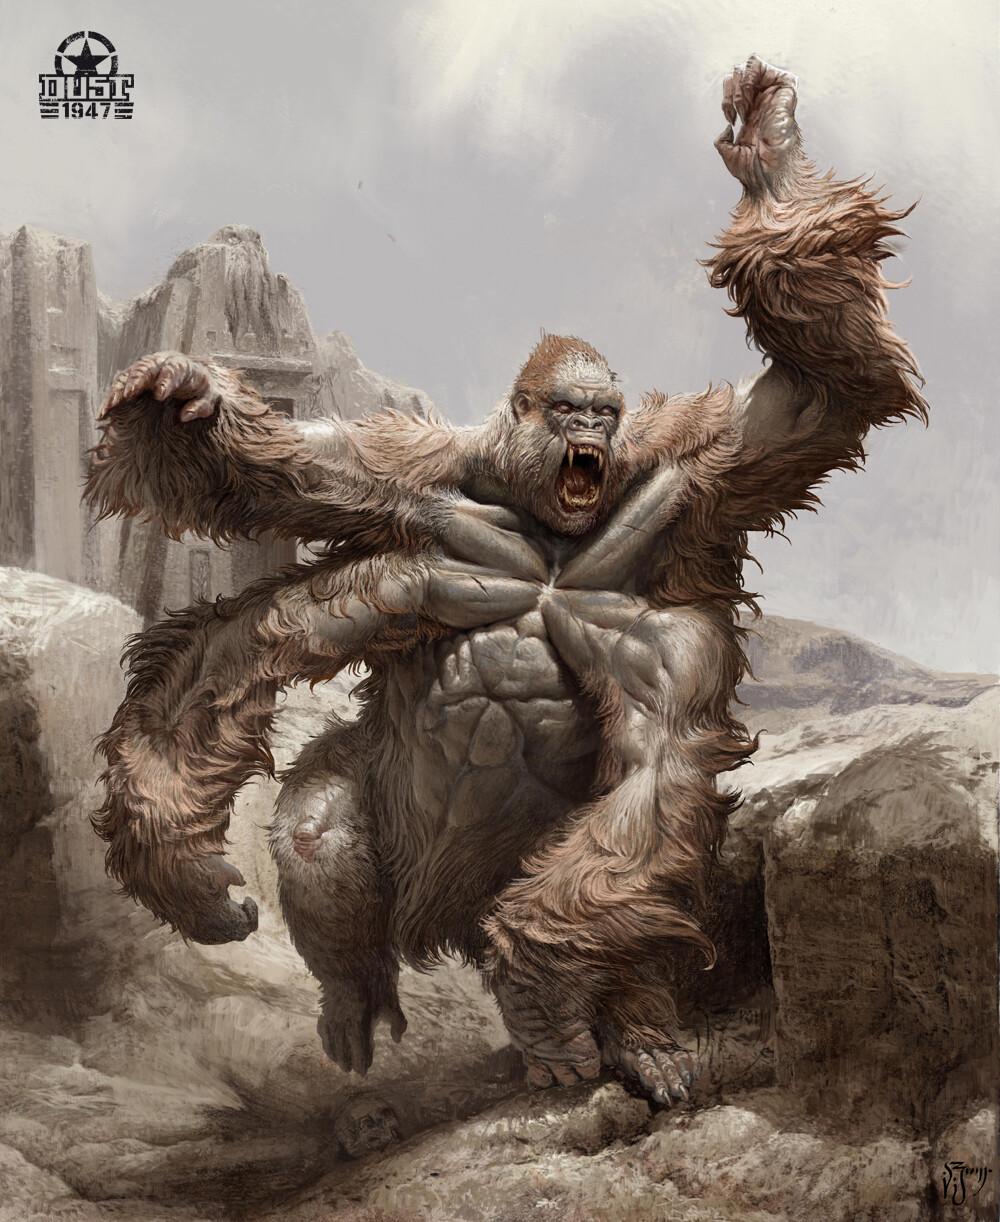 Daniel zrom danielzrom dust1947 marsgorilla1